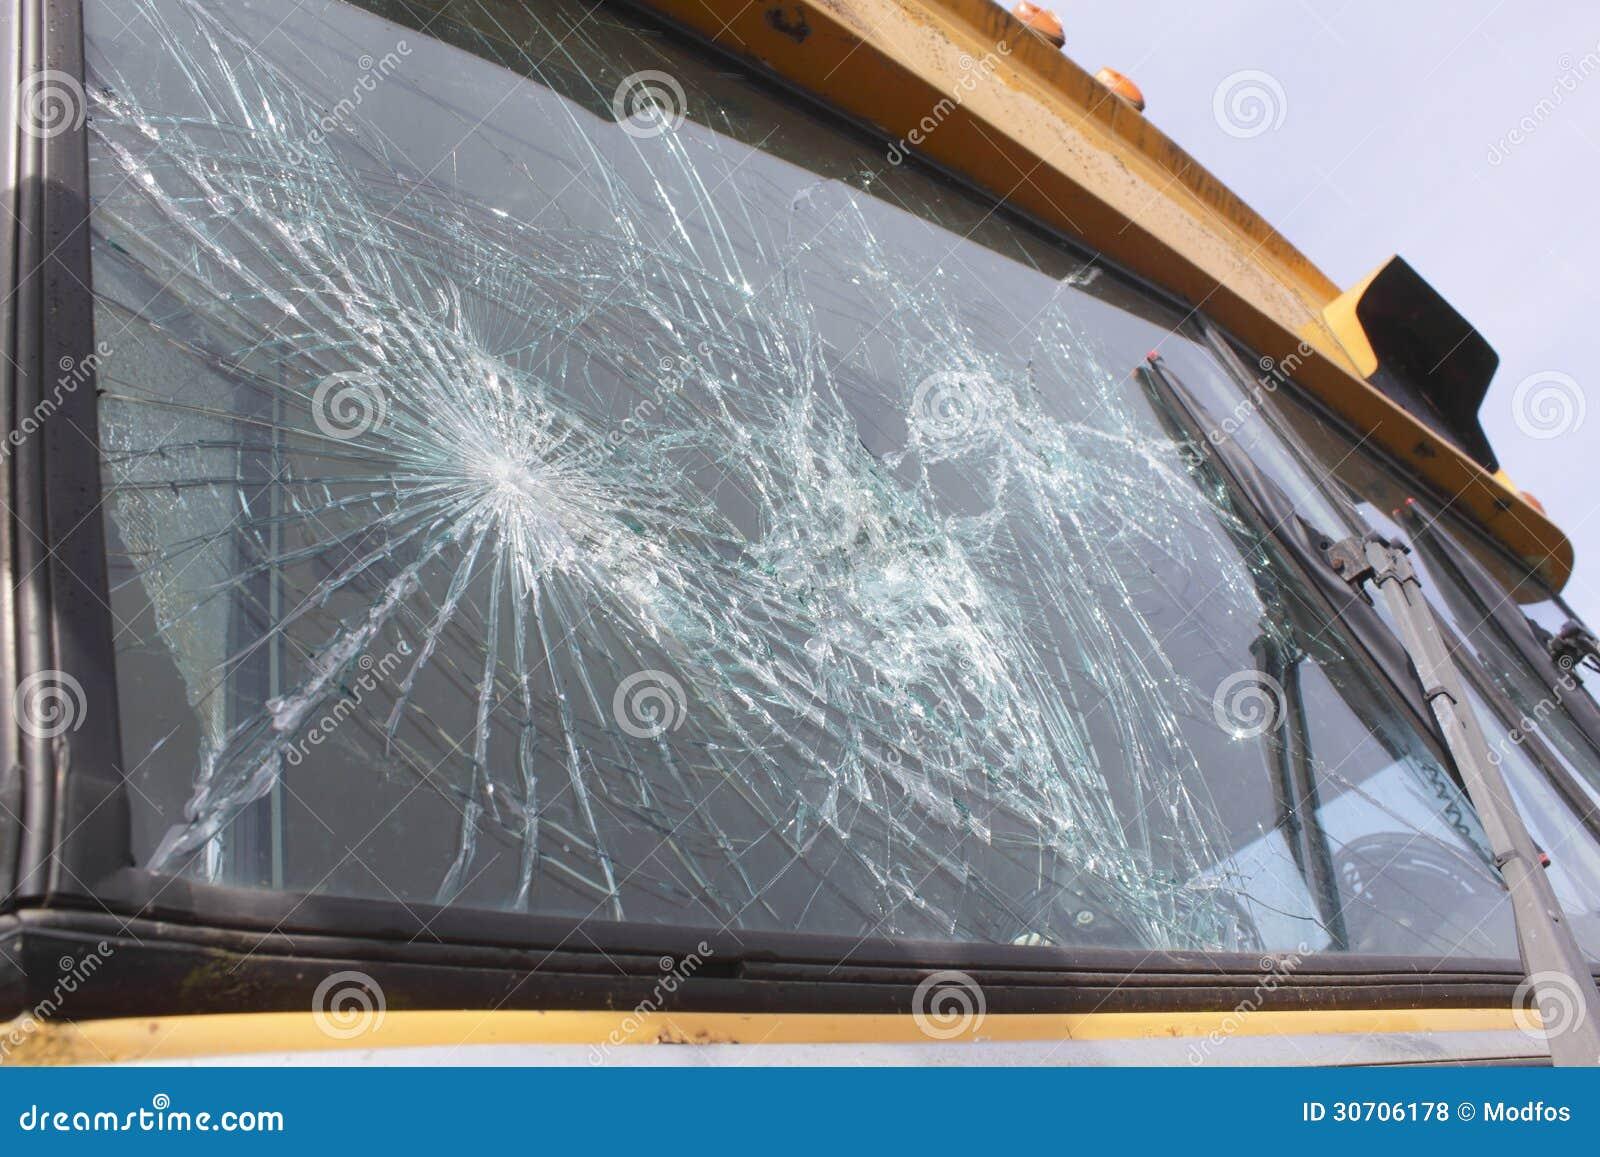 Glazier Removing Windshield Stock Photo - Image of vehicle, glazier ...